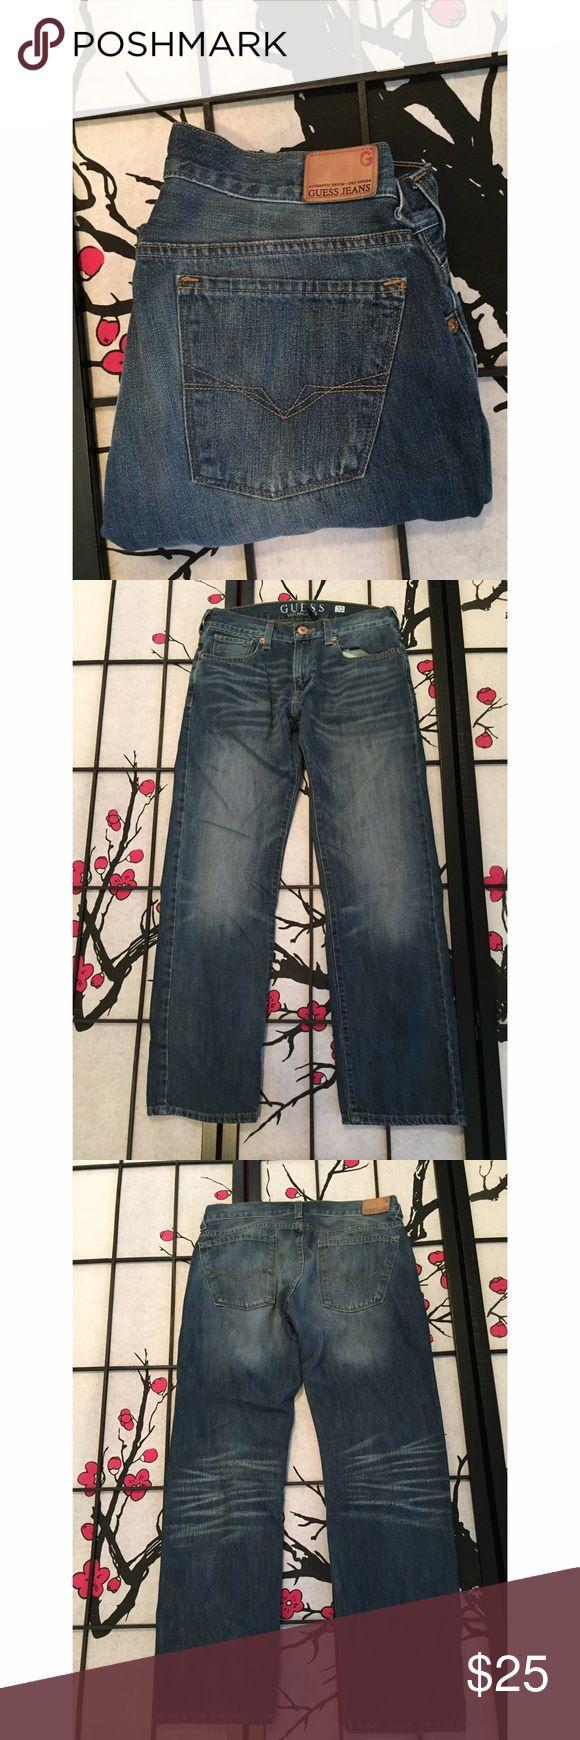 b9ed5b4d29e0cc8549959d1332c05910 guess jeans jeans straight